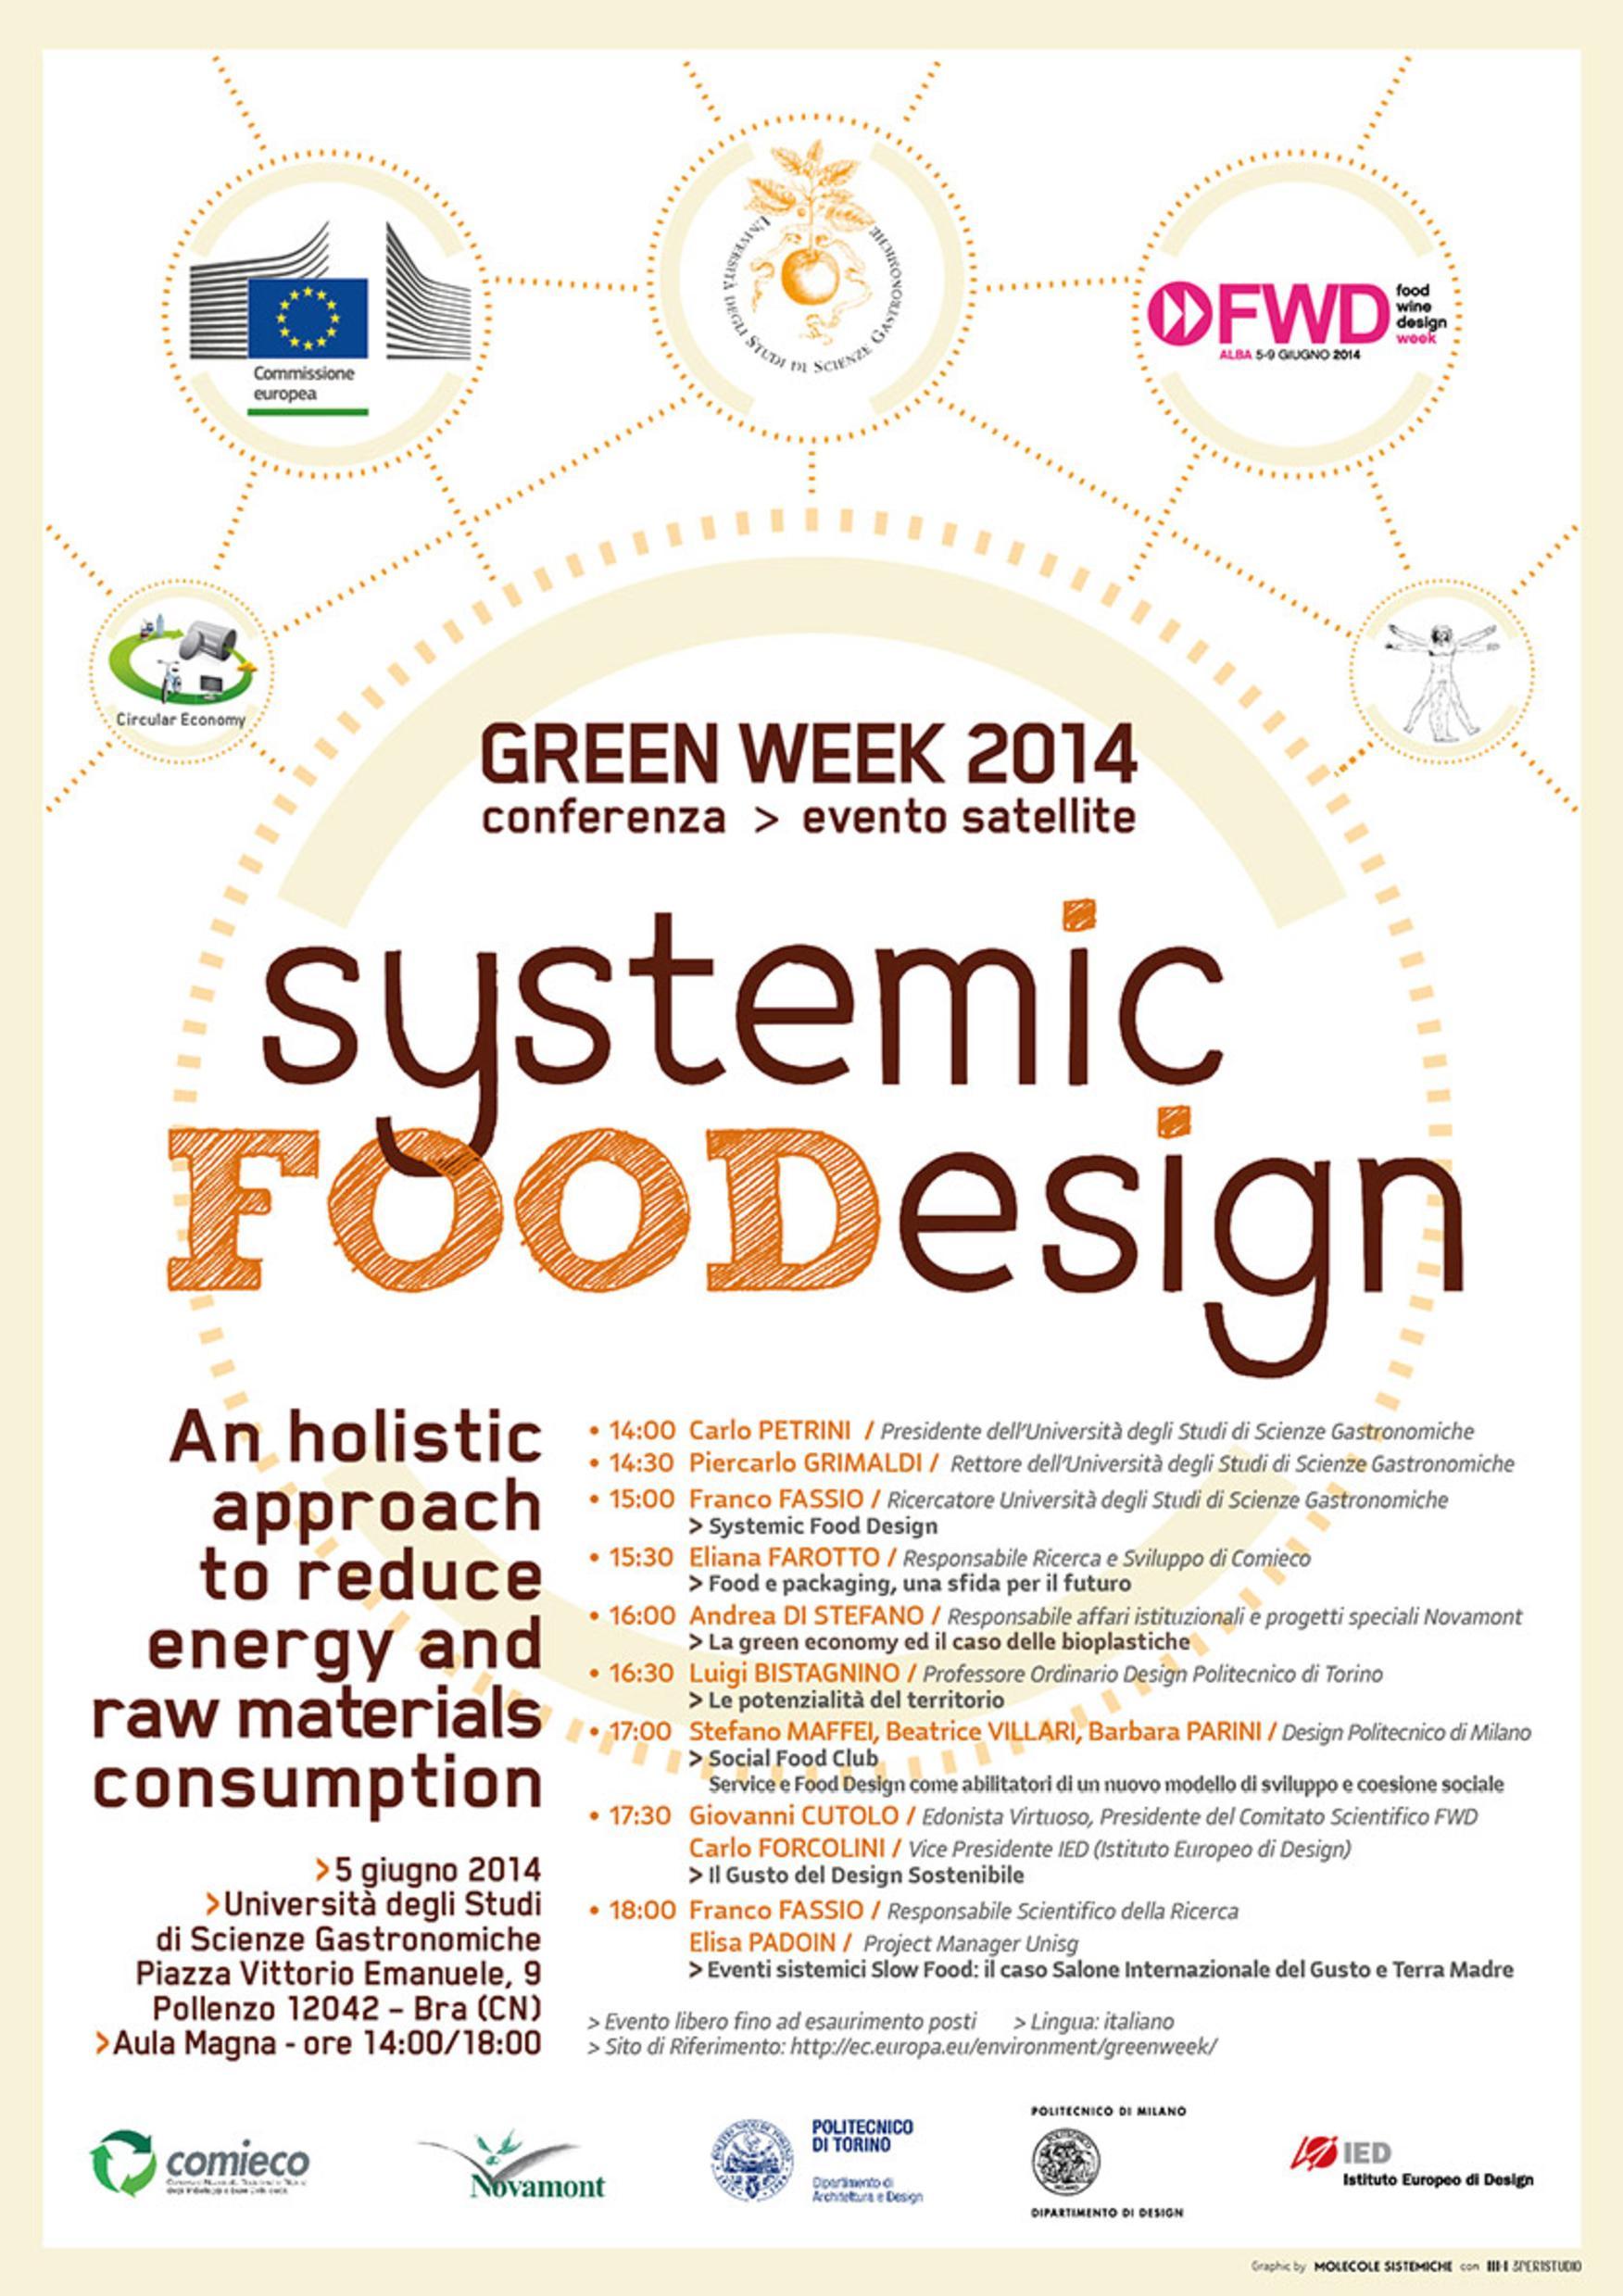 Systemic Food Design